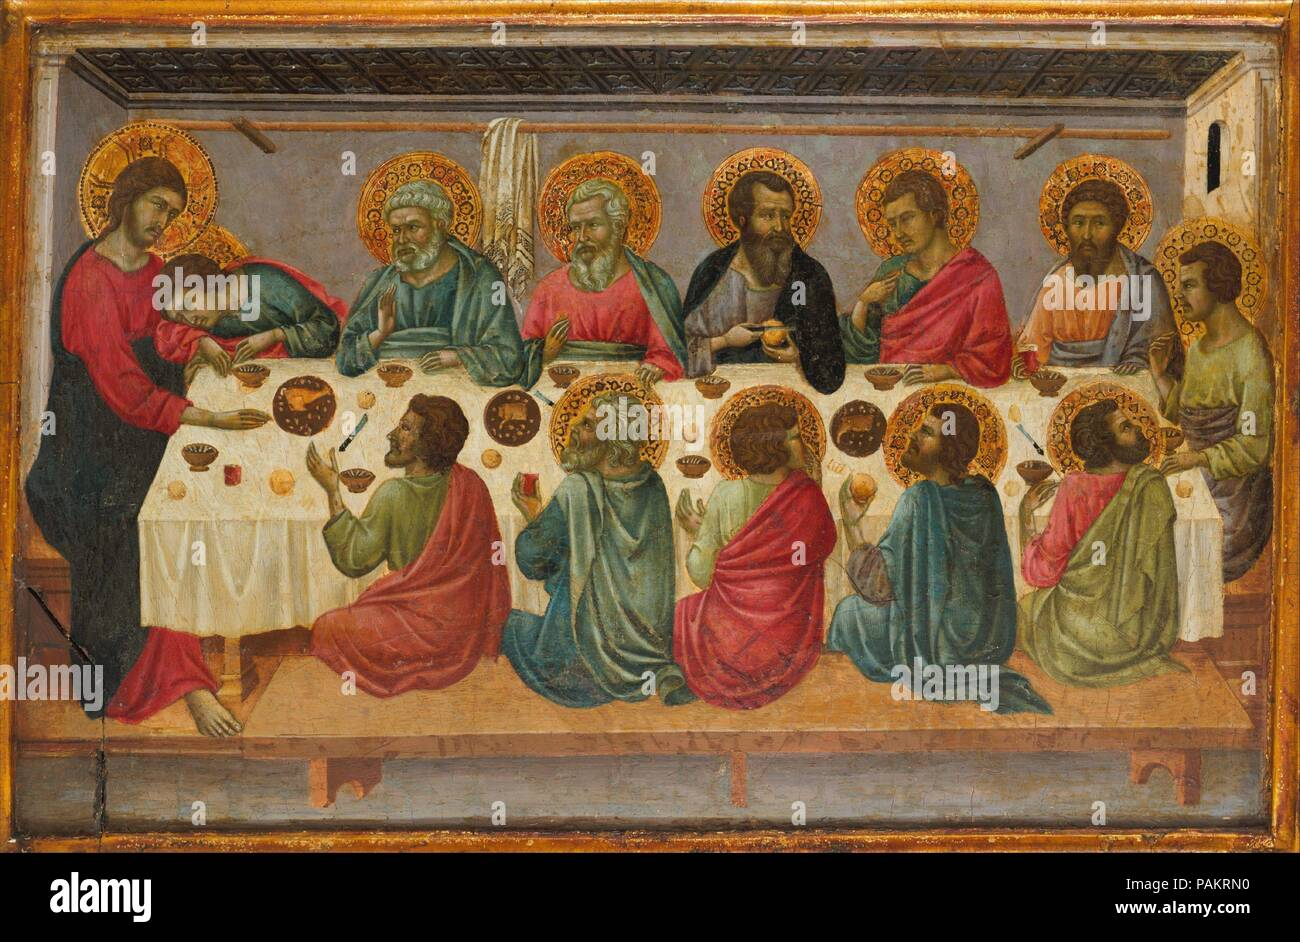 La Derniere Cene Artiste Ugolino Da Siena Ugolino Di Nerio Italien Sienne Active En 1317 Mort